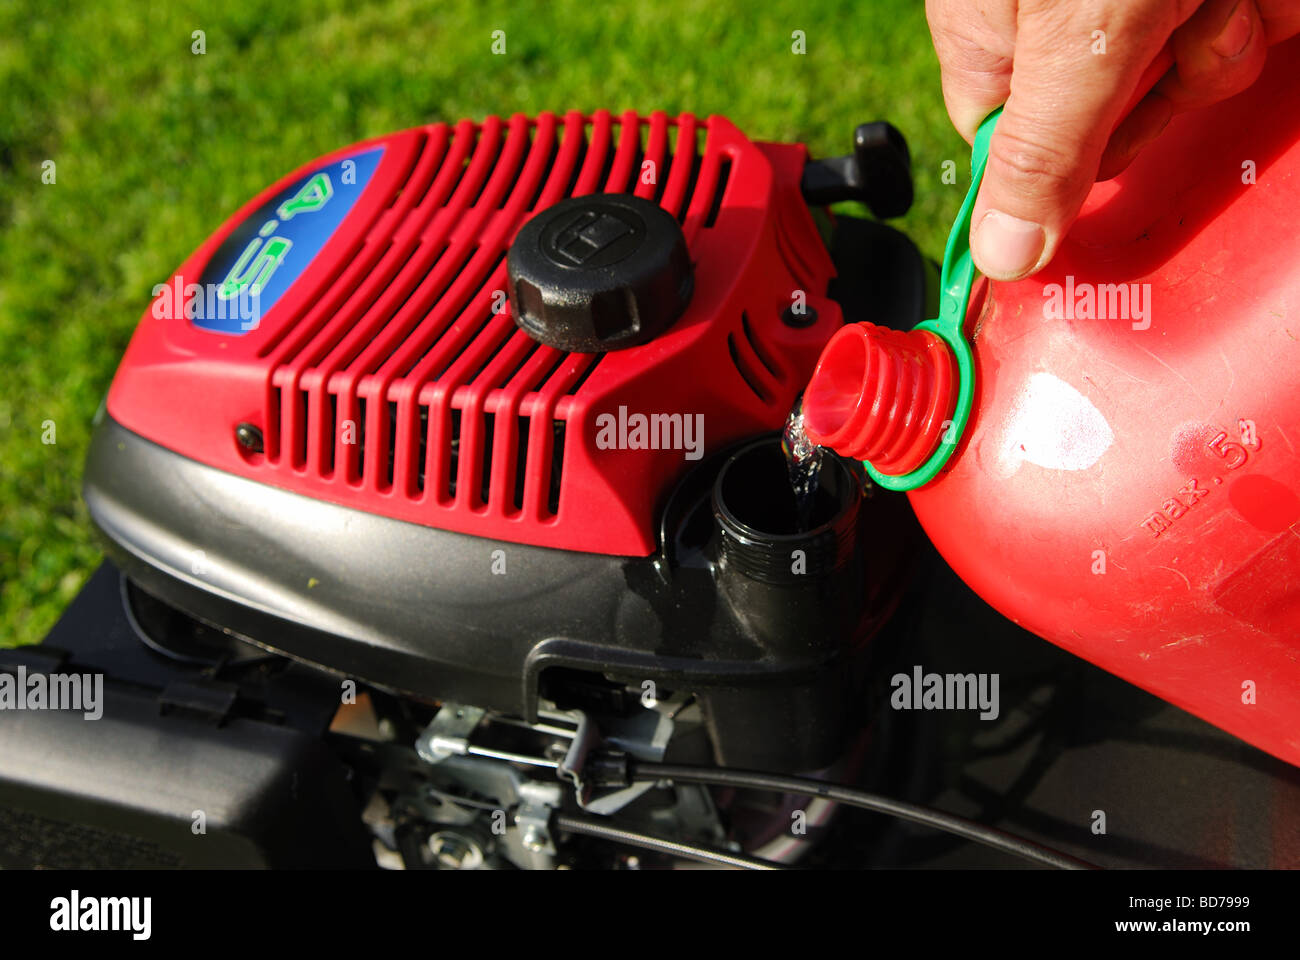 Lawnmower Fuel Refill. - Stock Image